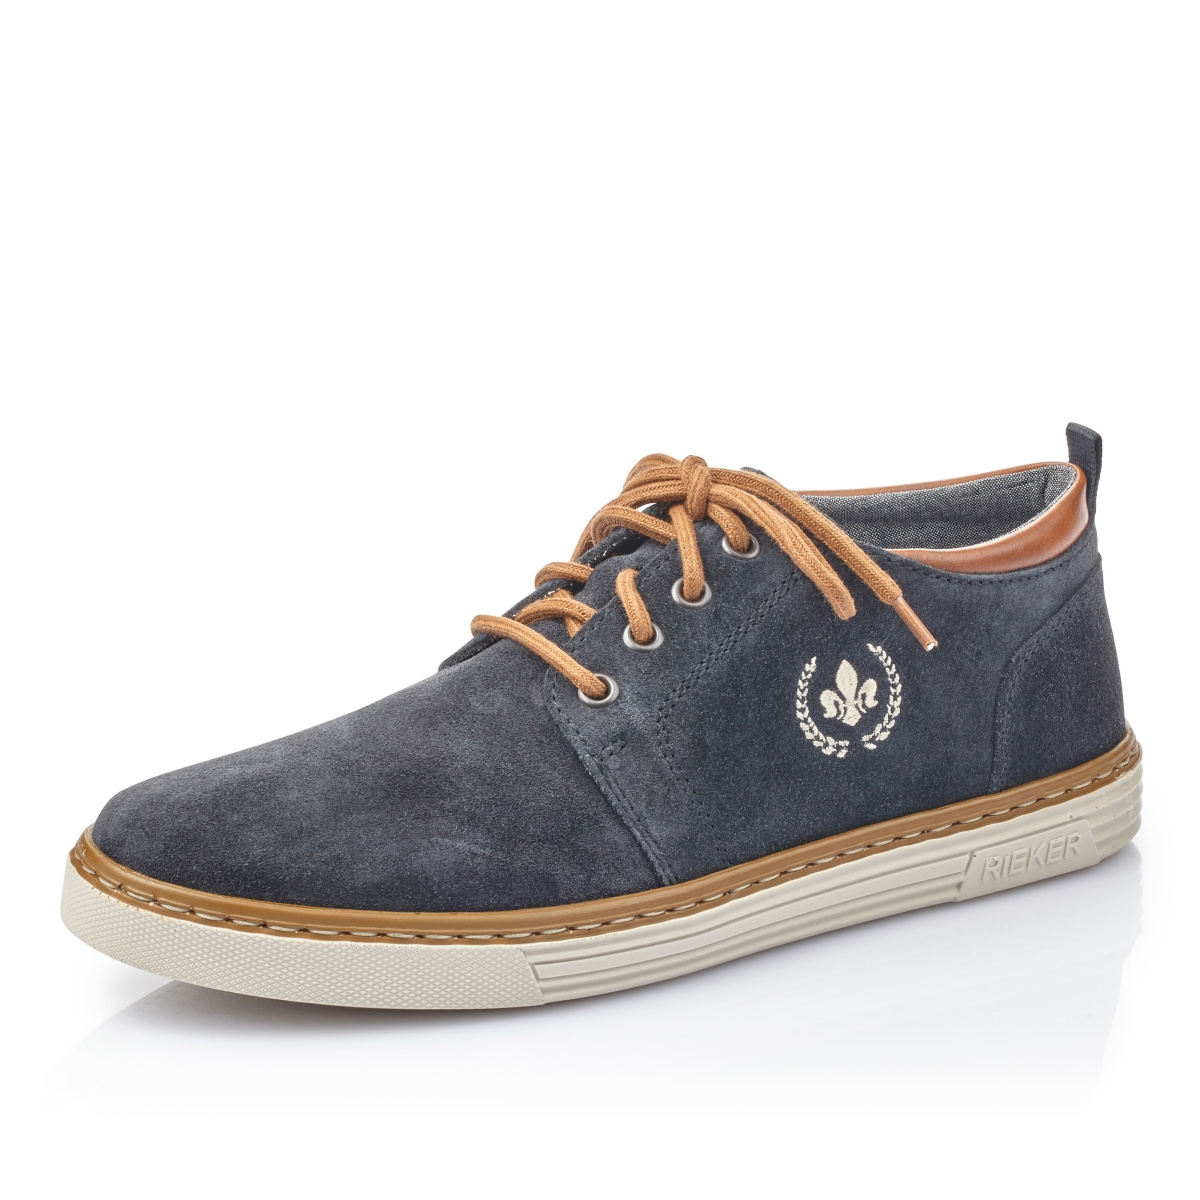 8497d575c8 detail Pánská obuv RIEKER B4930-14 BLAU F S 9